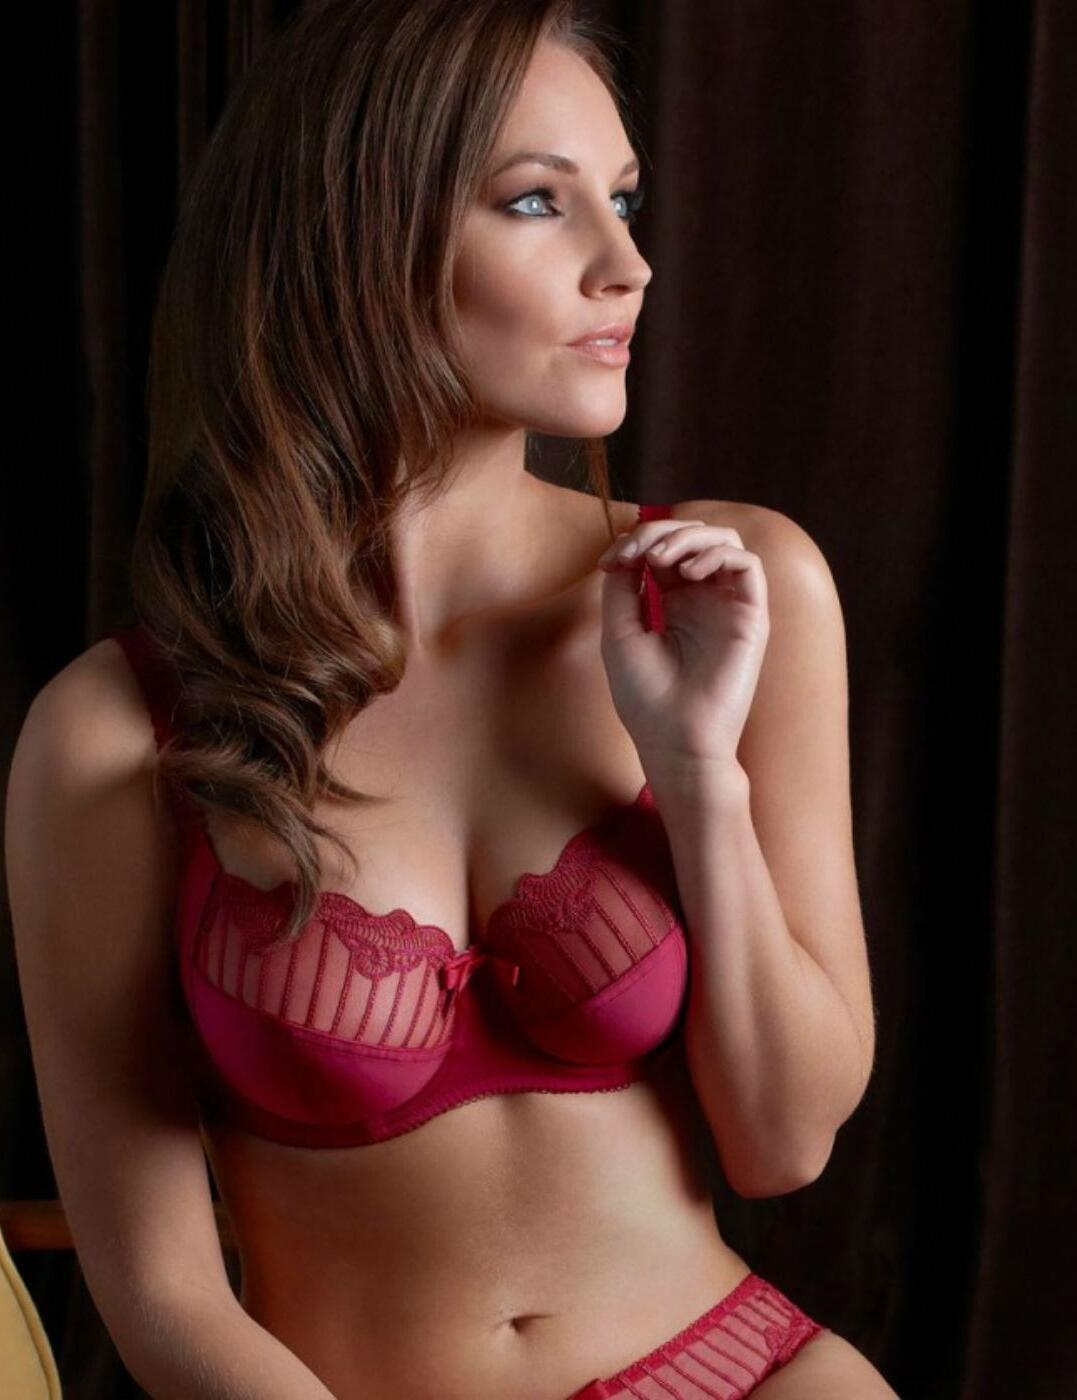 1295010 Charnos Sienna Side Support Bra - 1295010 Red